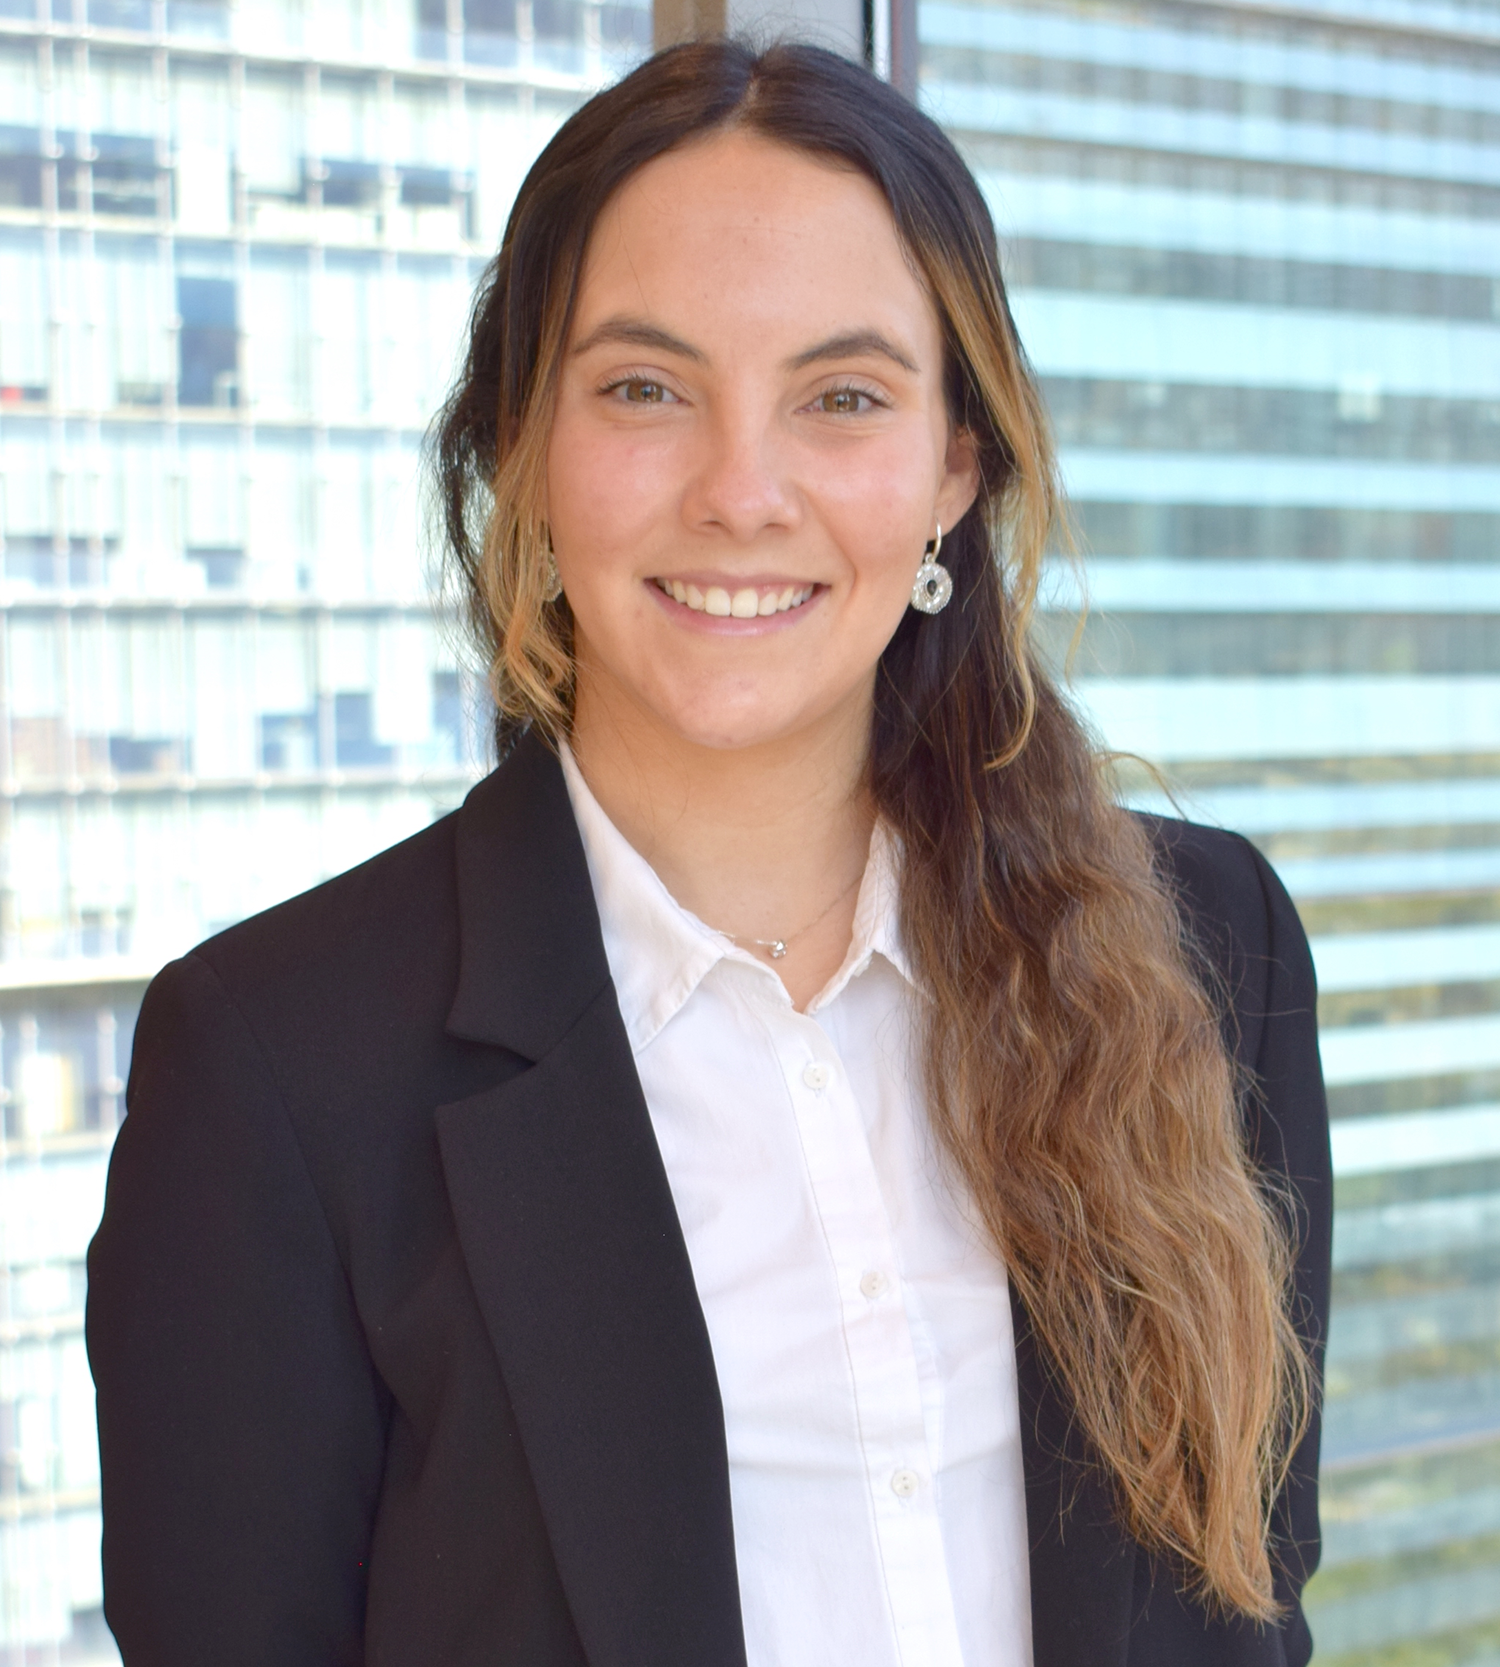 Antonia Olivares